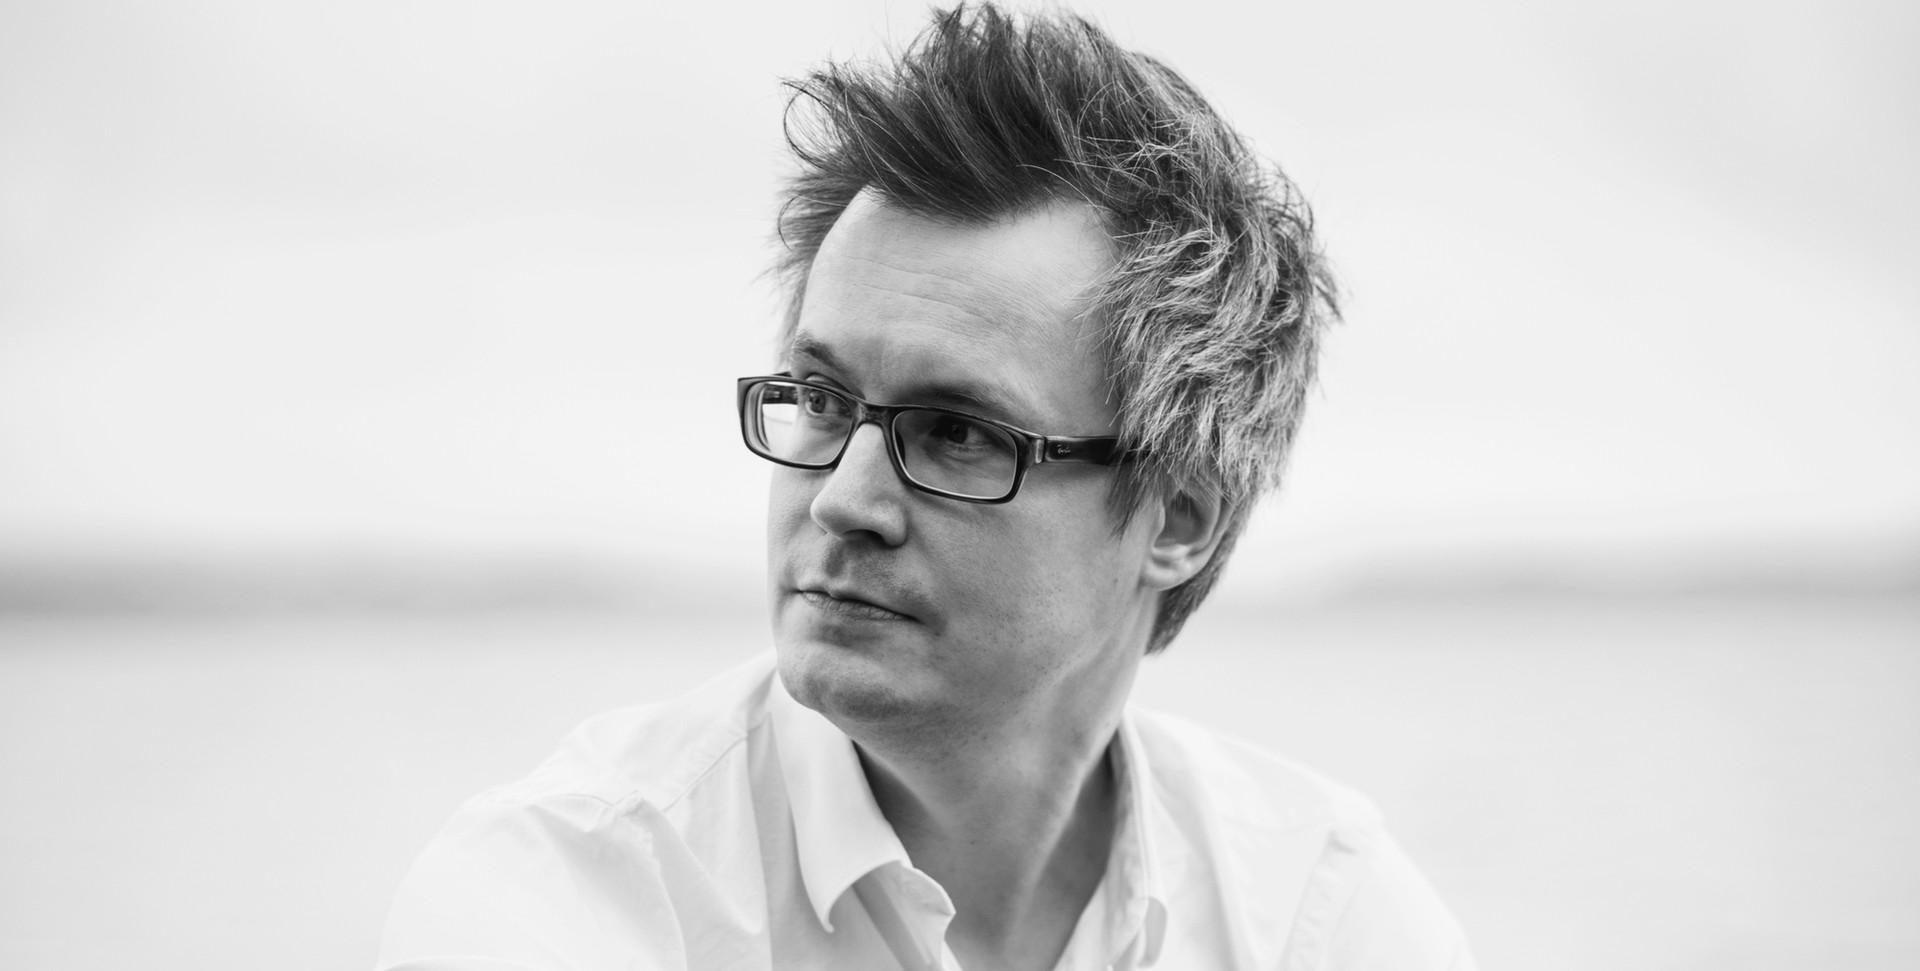 Markku Klami, composer